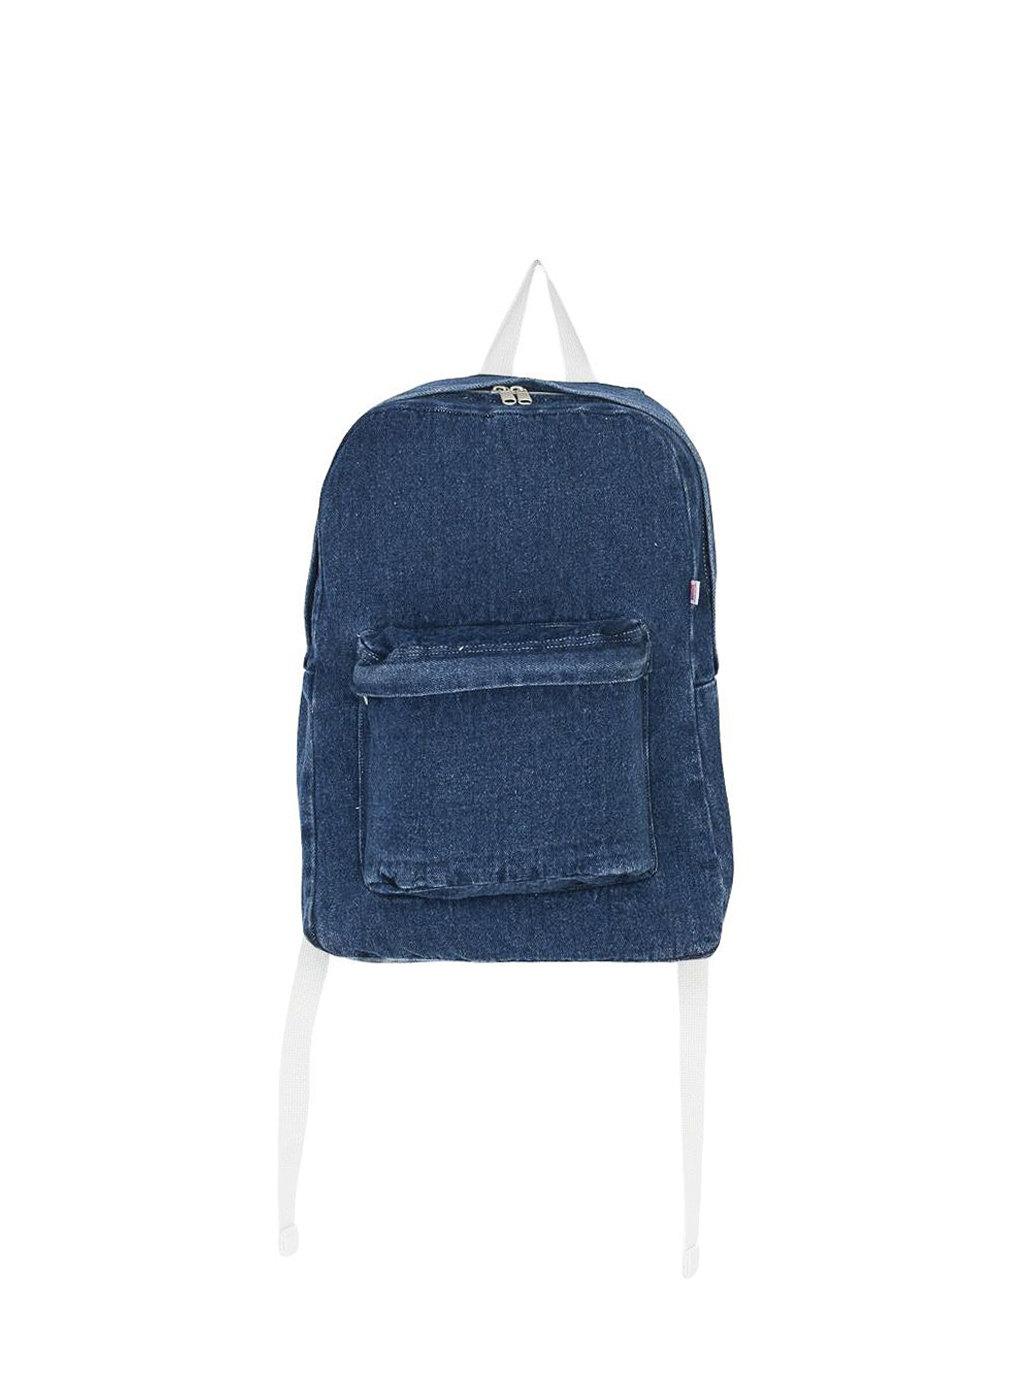 Denim School Bag | American Apparel